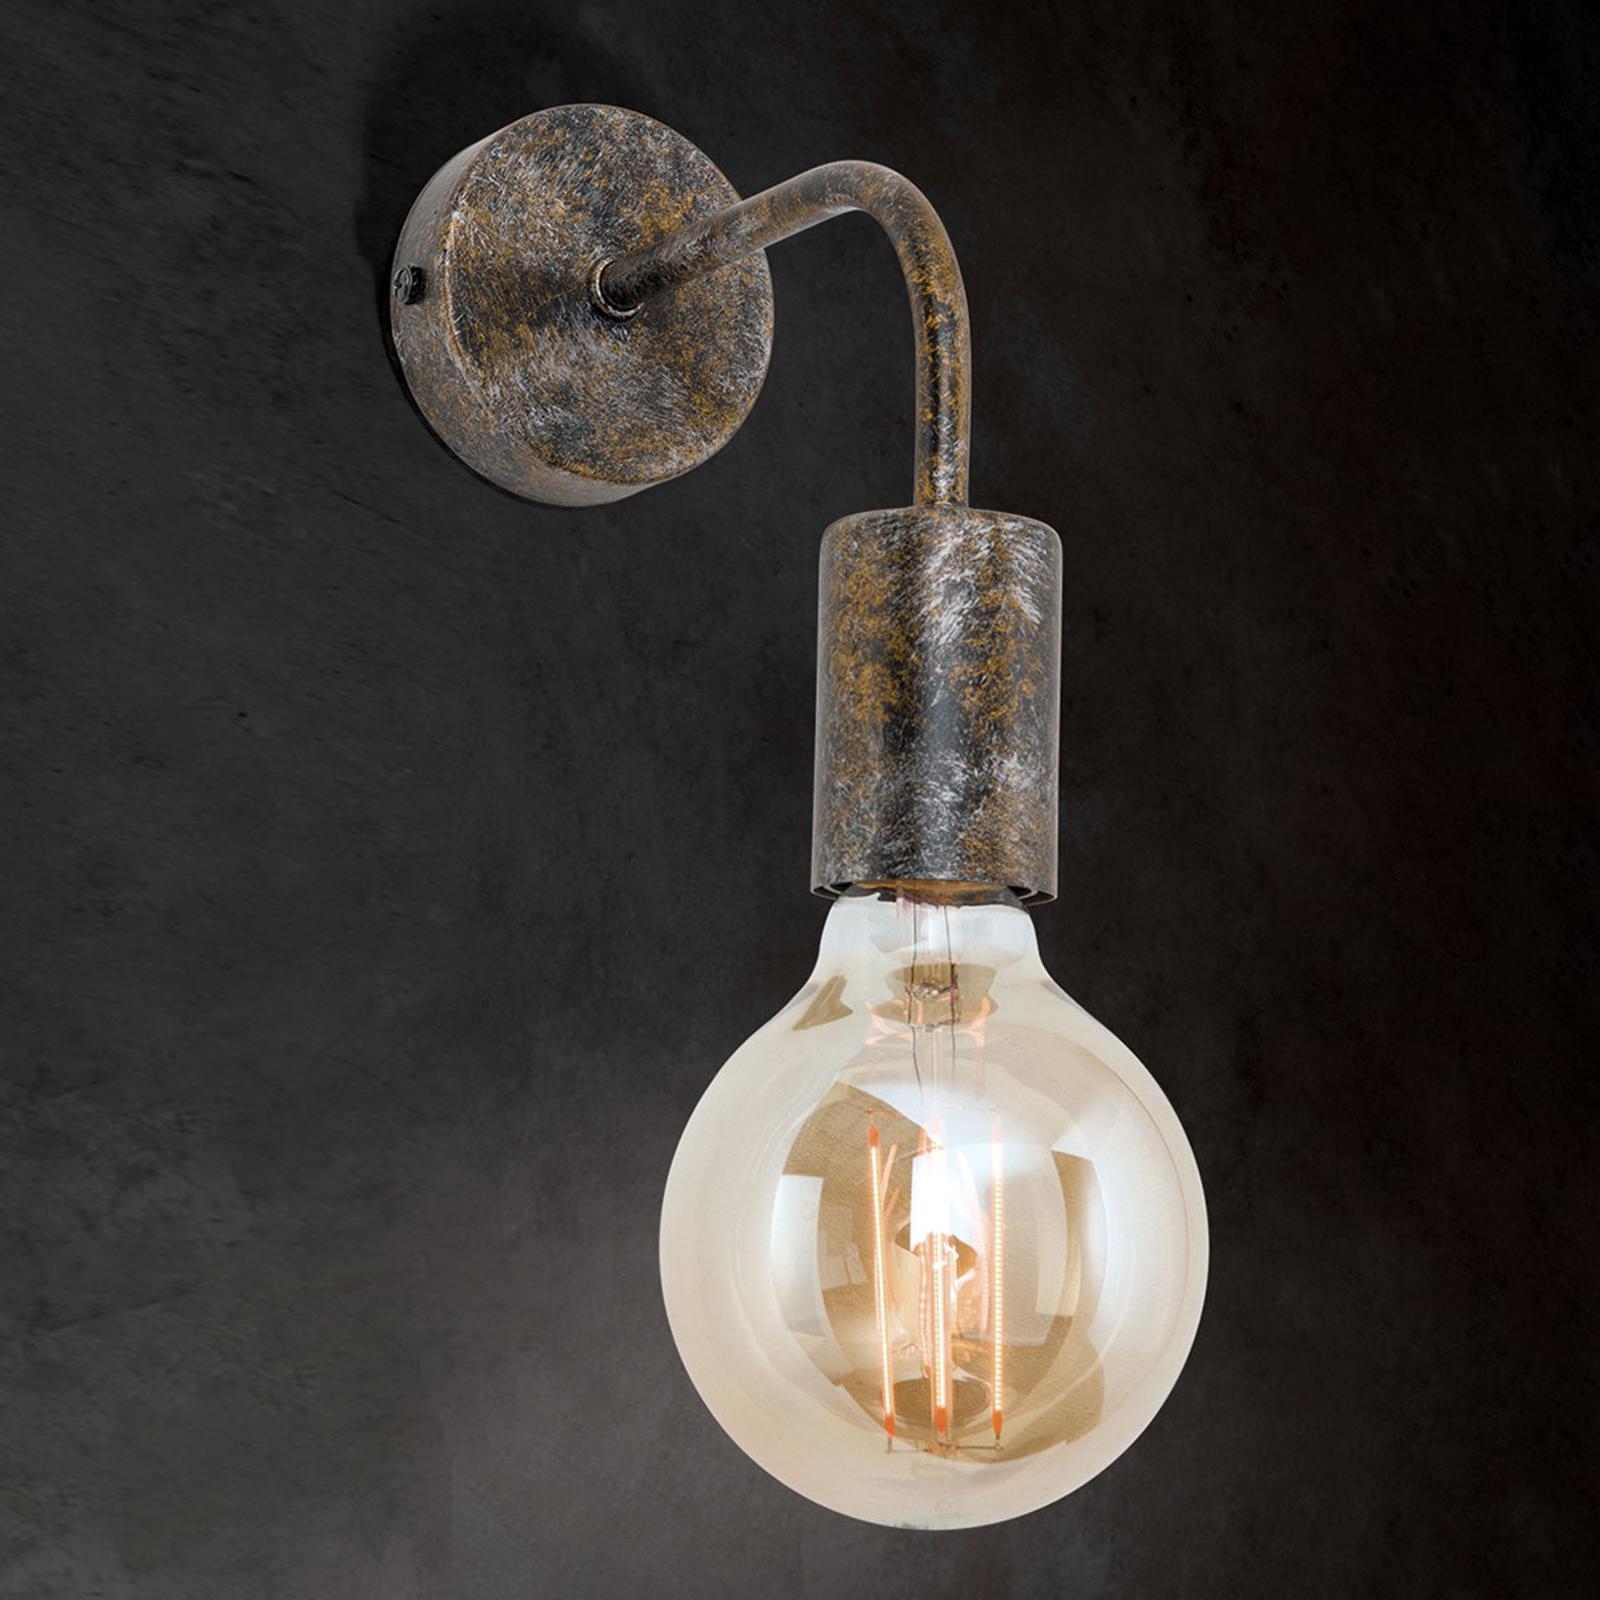 Vegglampe Rati i vintagestil.